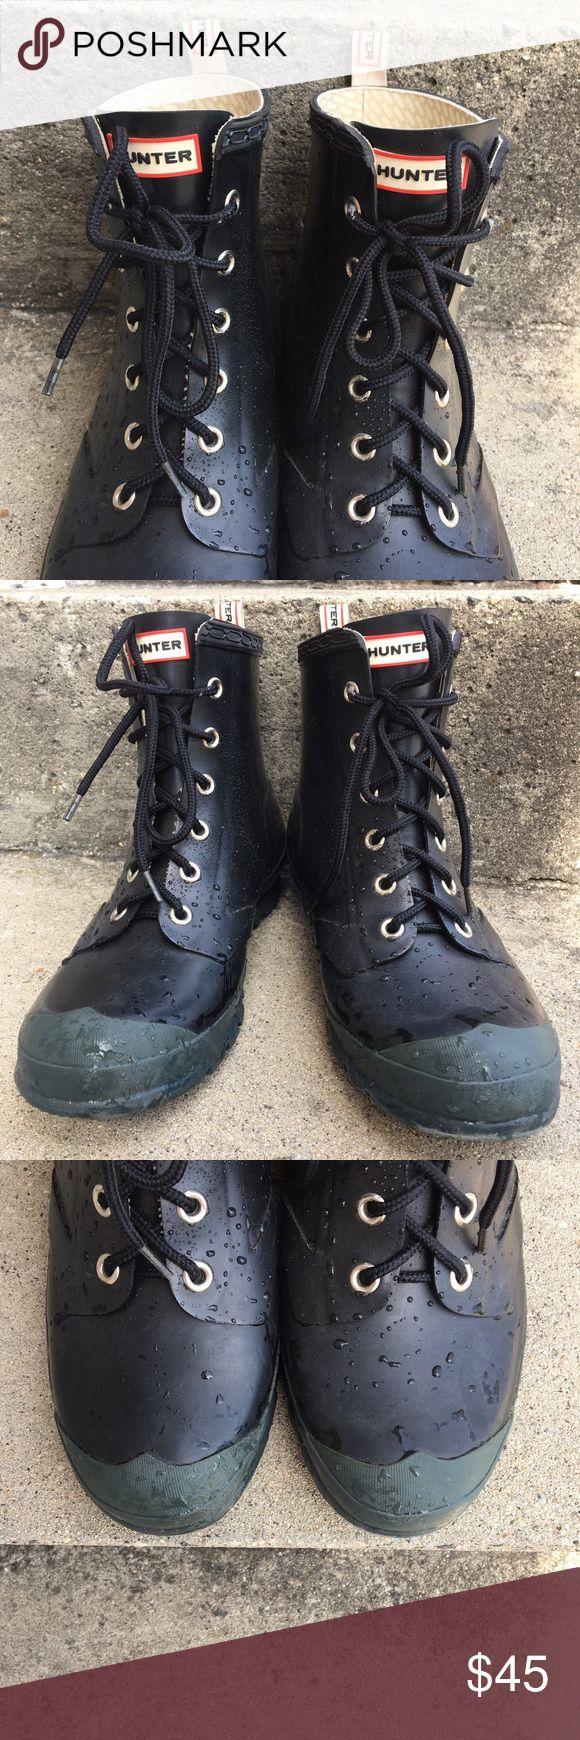 Hunter Combat Rainboots Barely worn!!  Short, black, tie-up, Hunter wellies! Hunter Boots Shoes Winter & Rain Boots